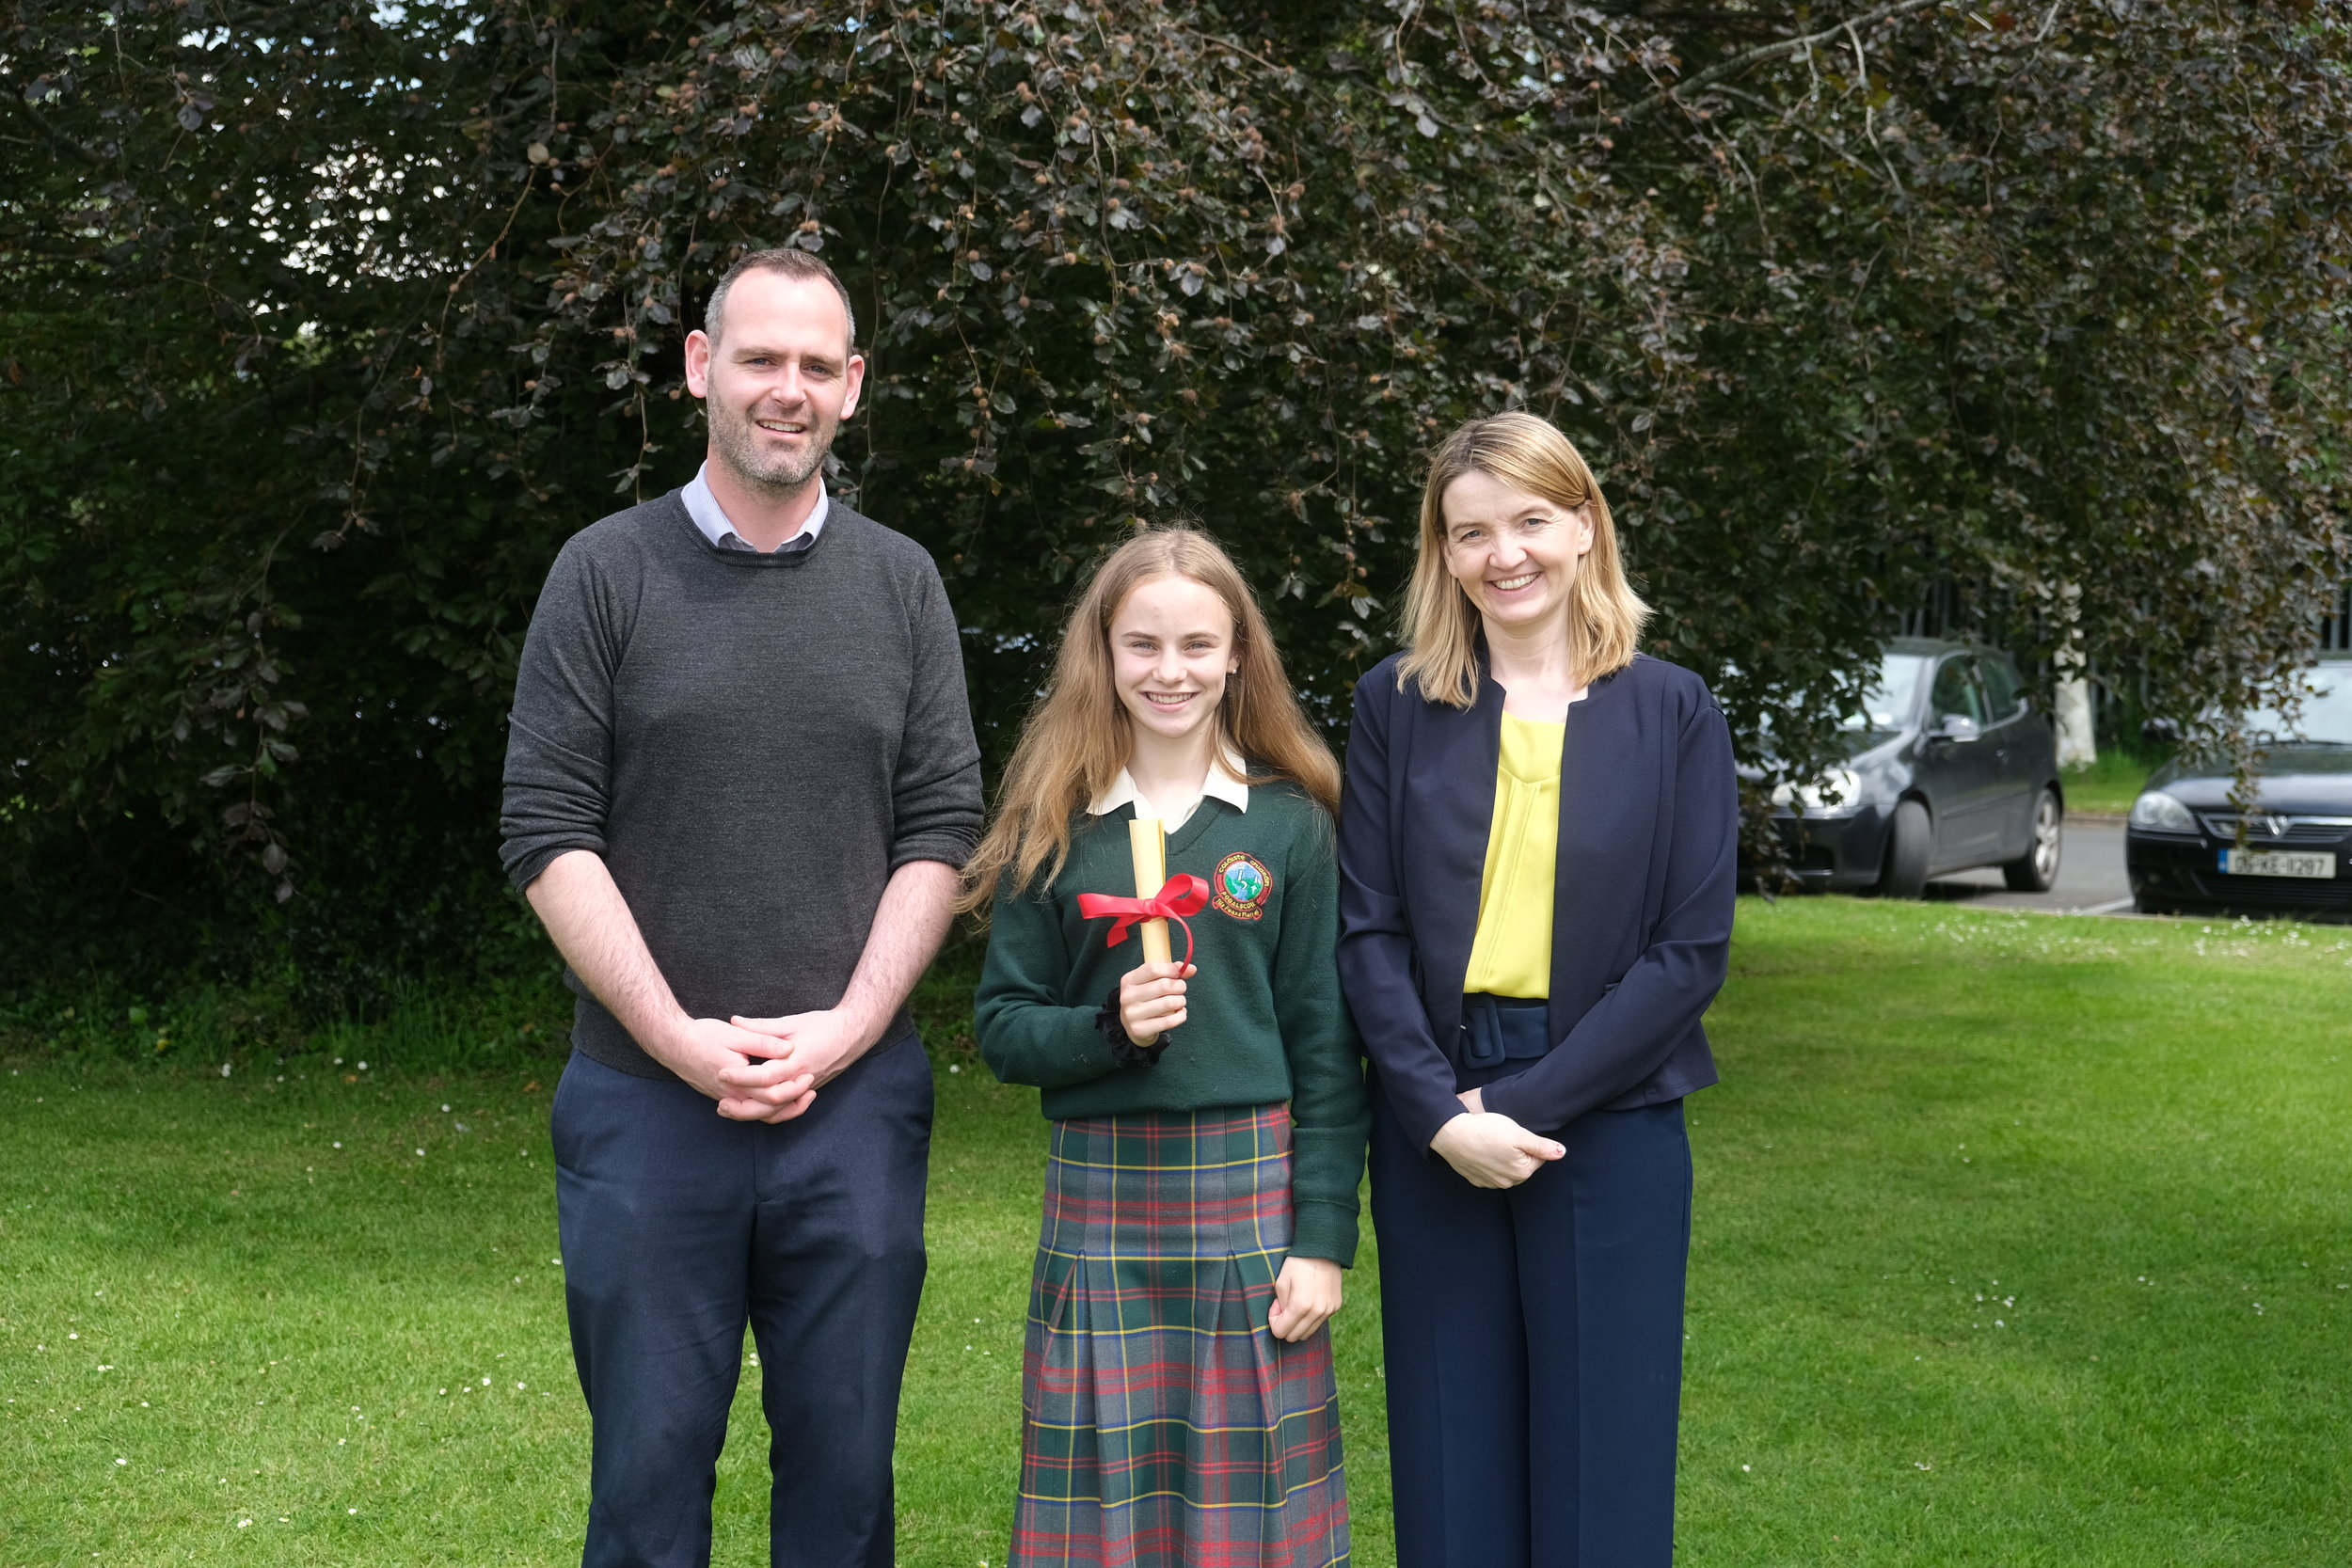 Gradam Gaeilge Award  Sean Cotter, Jodie Lawlor, C.Mhic Dhonncha